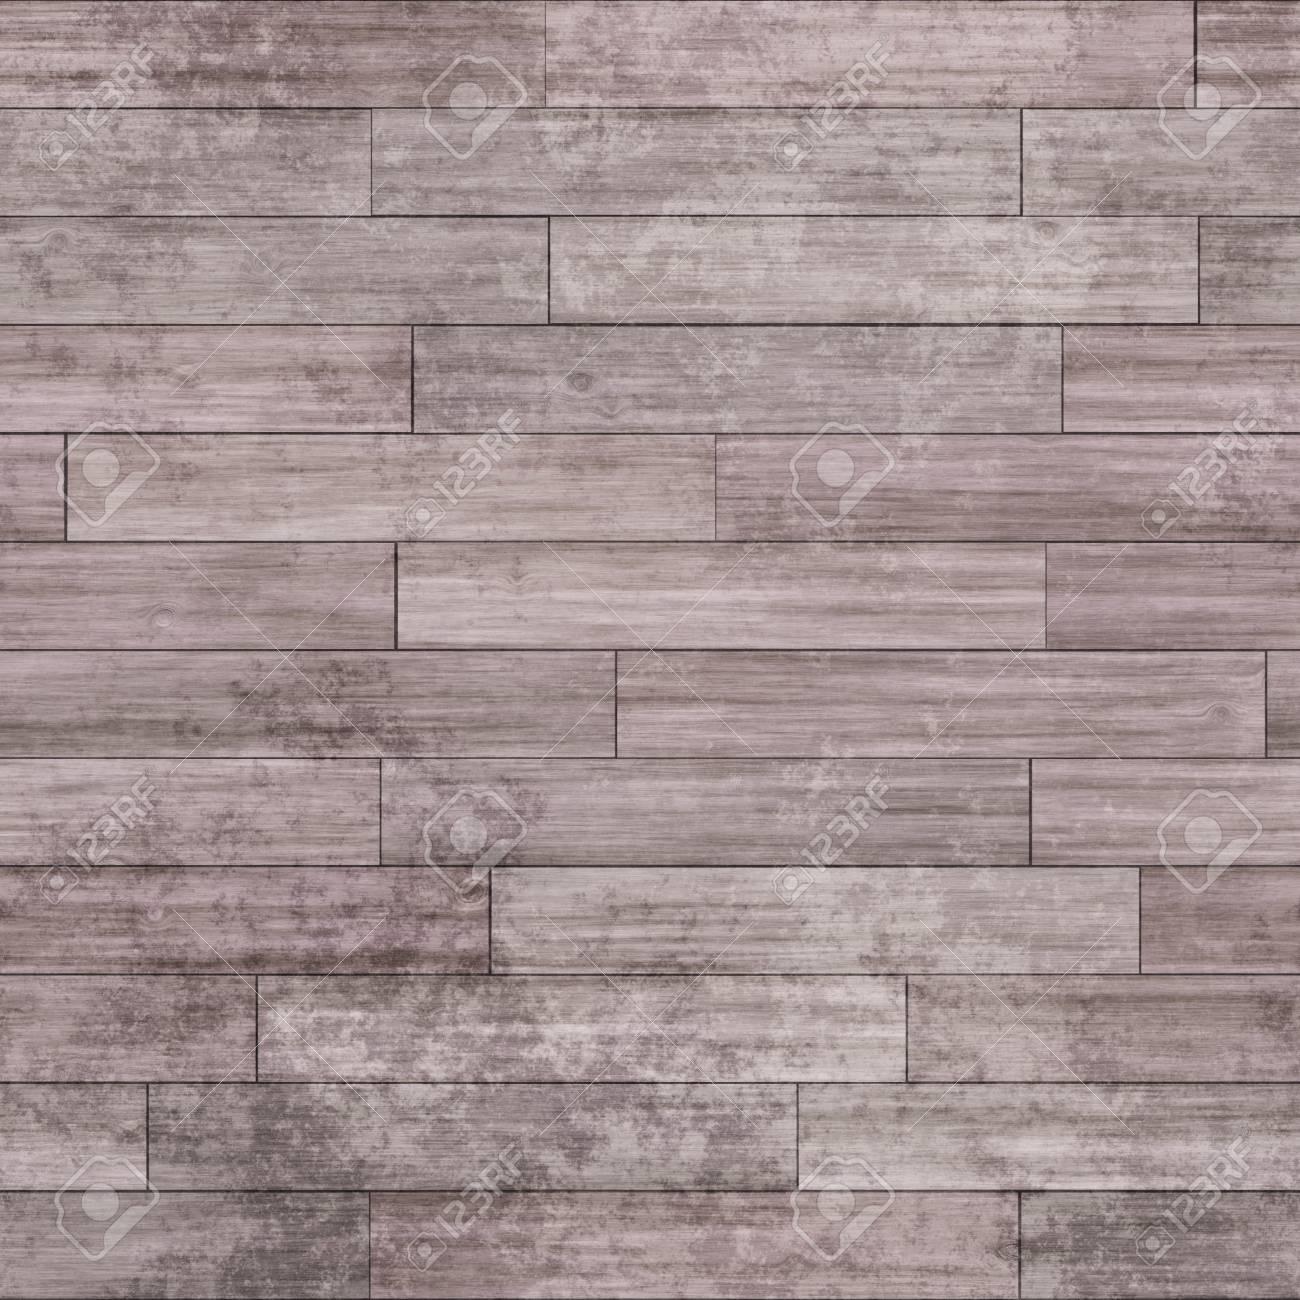 Abstract Natural Pattern Parquet Floor Interior Room Design